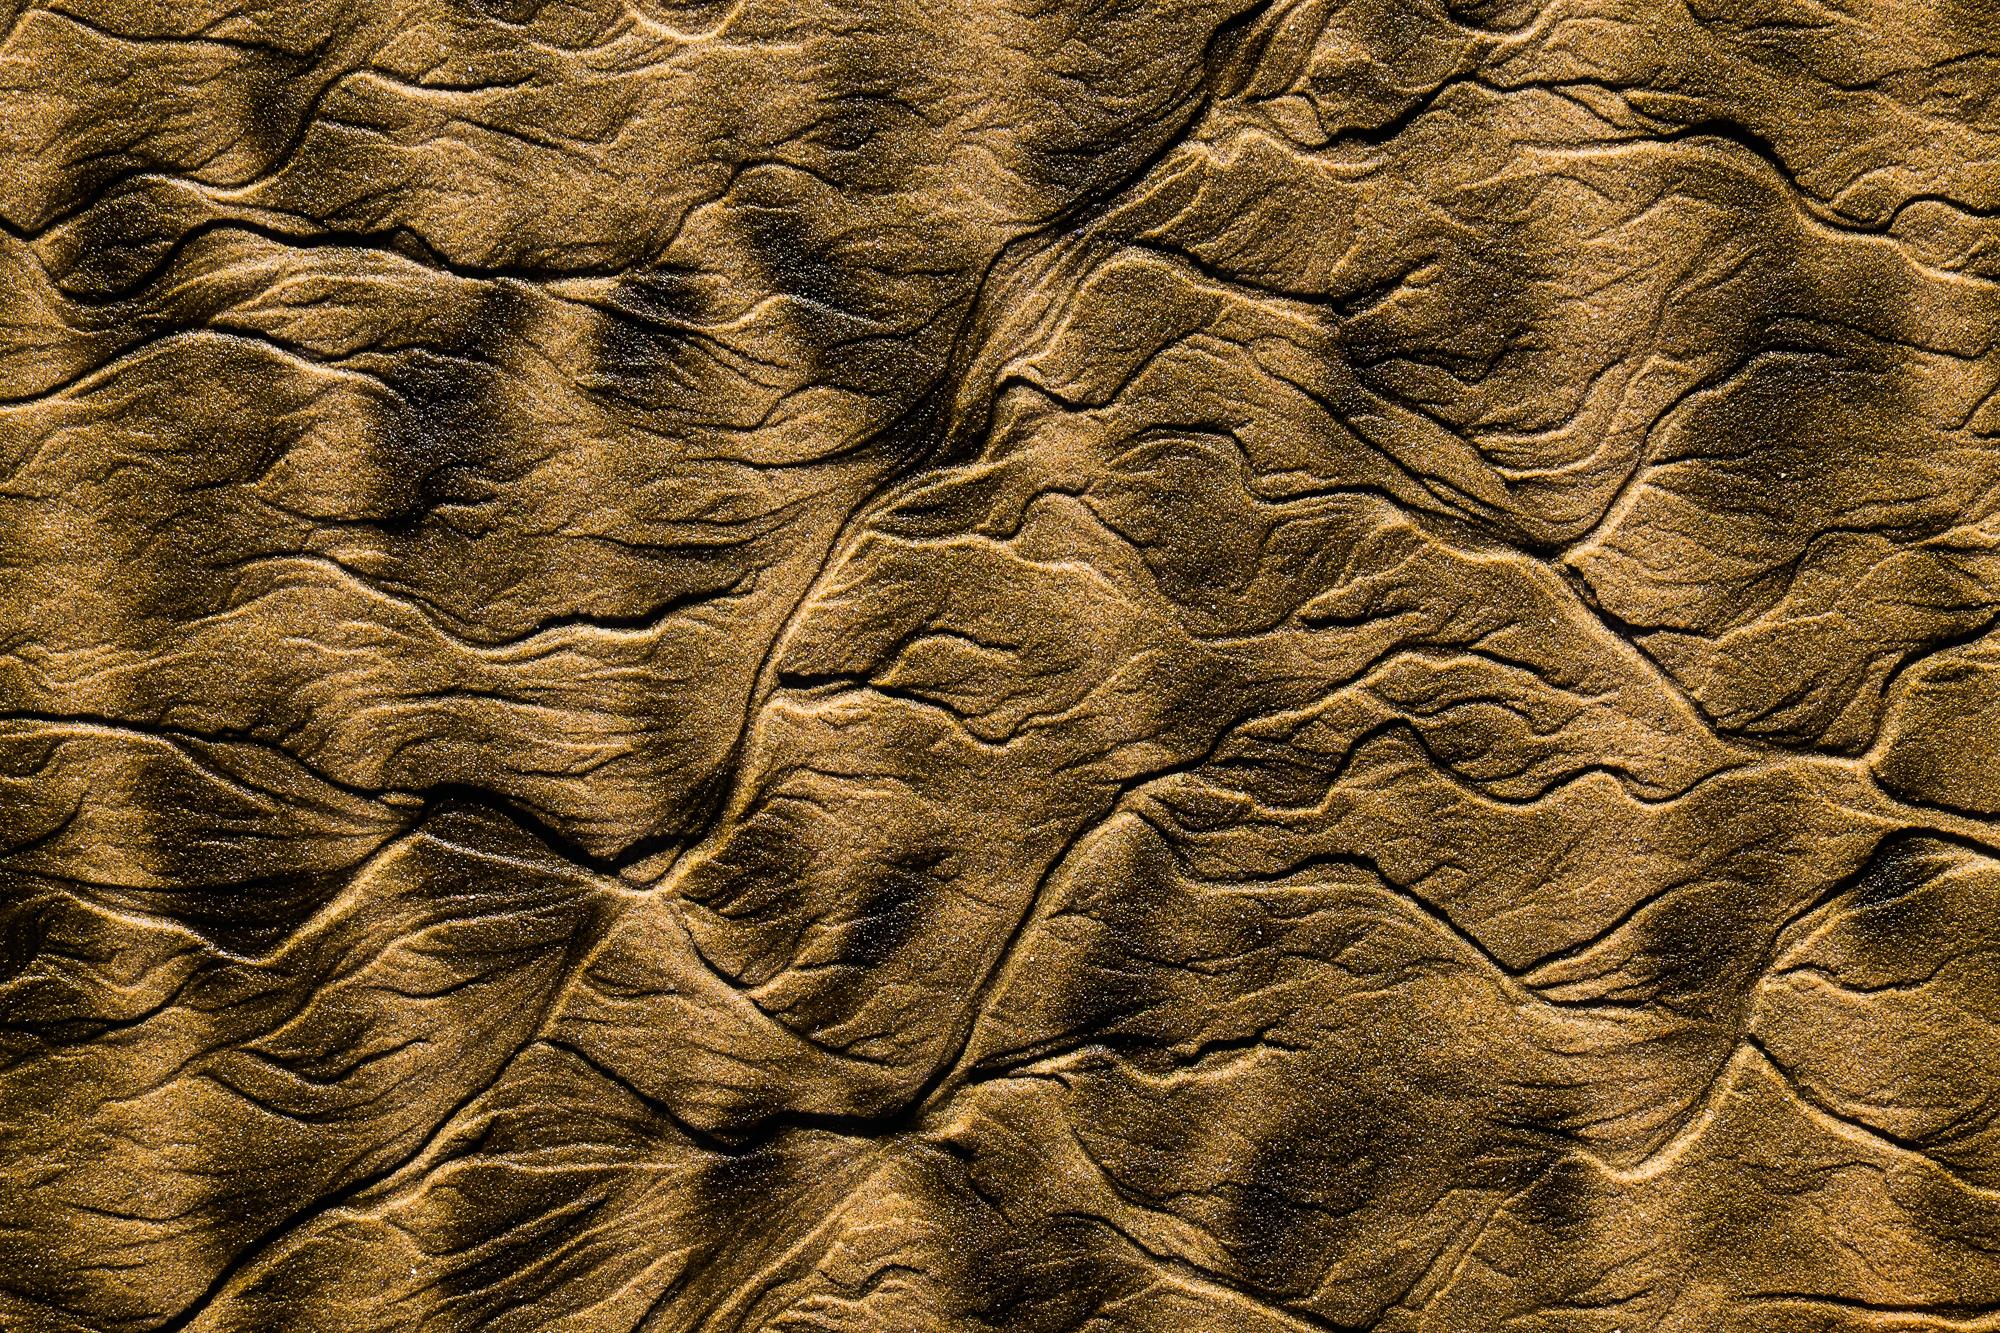 The Anatomy of Sand